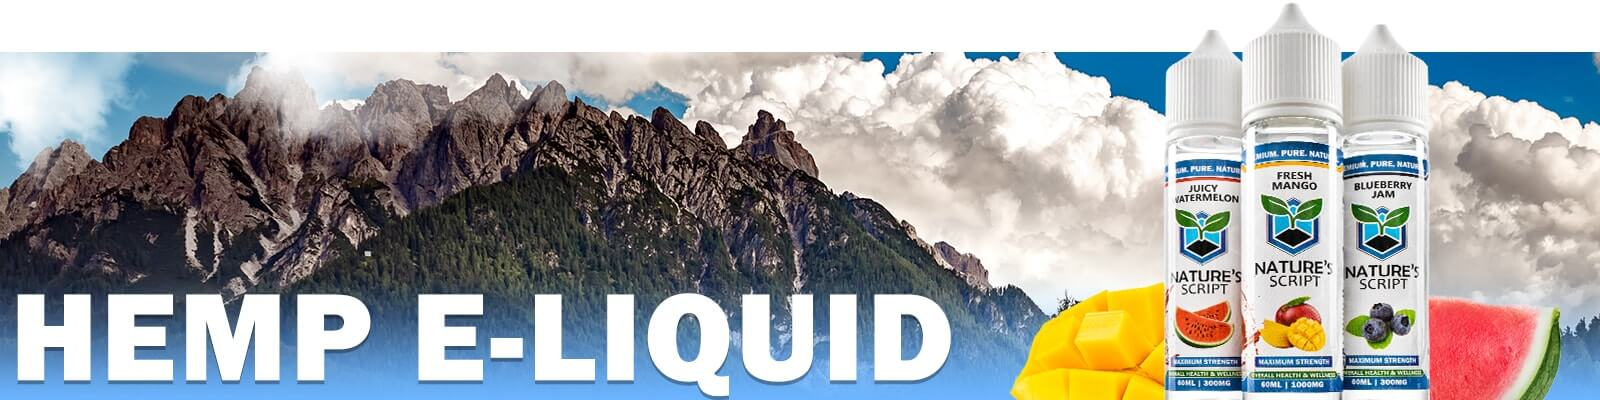 Hemp E-Liquid